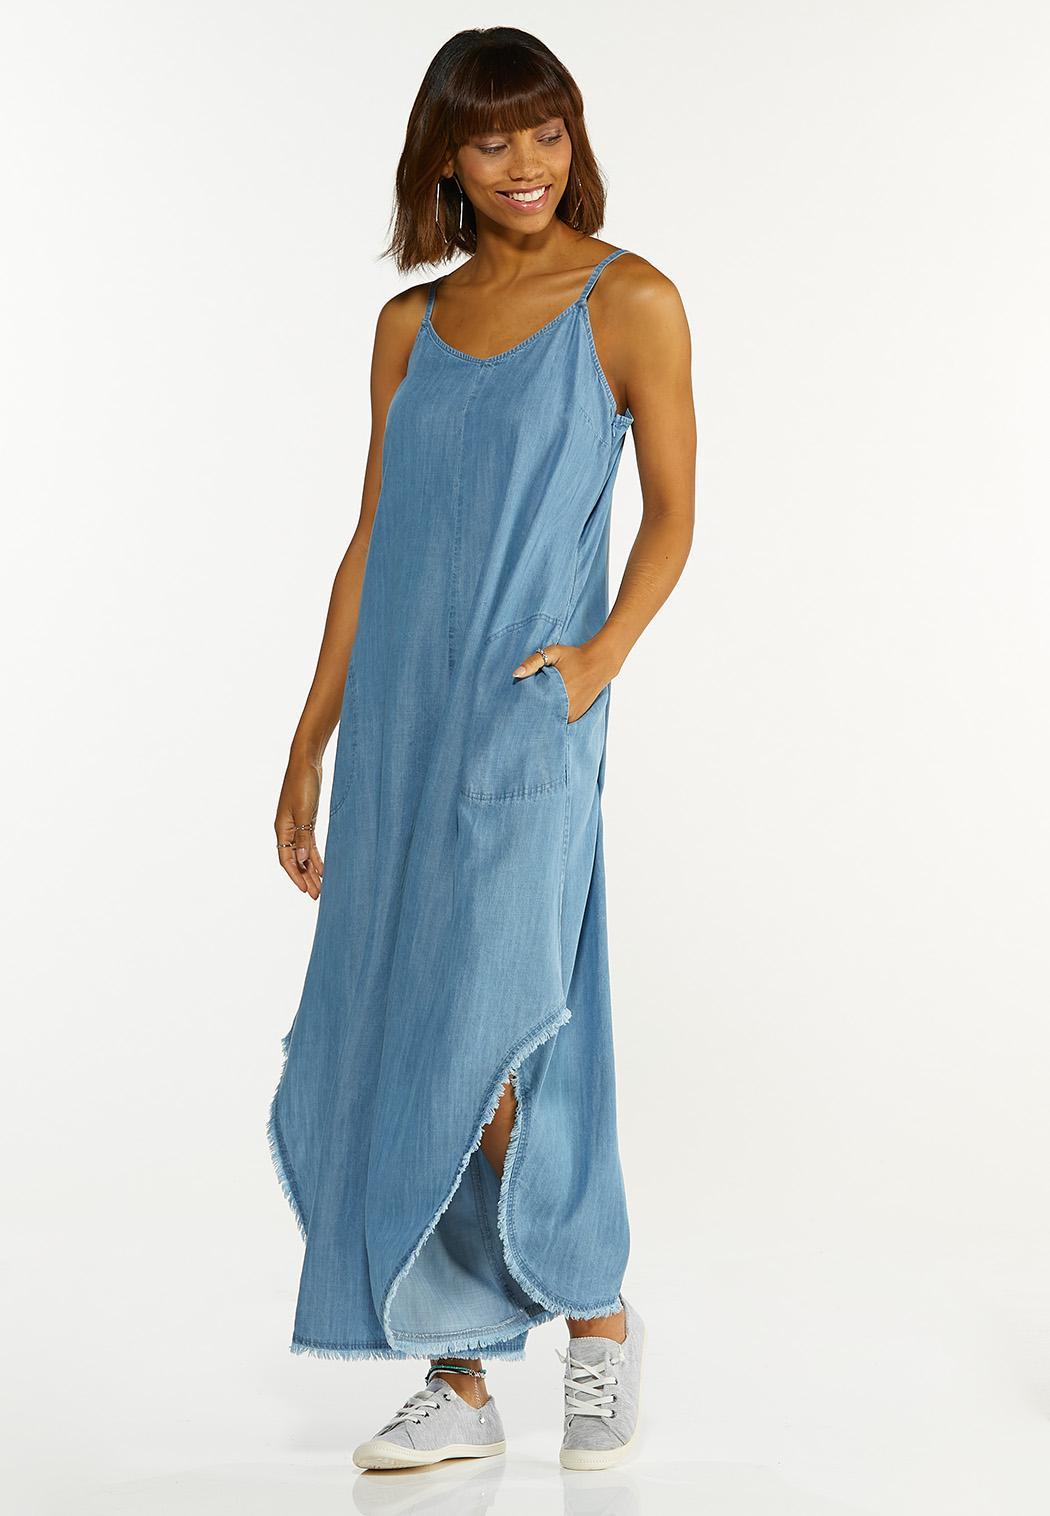 Plus Size Chambray Genie Jumpsuit